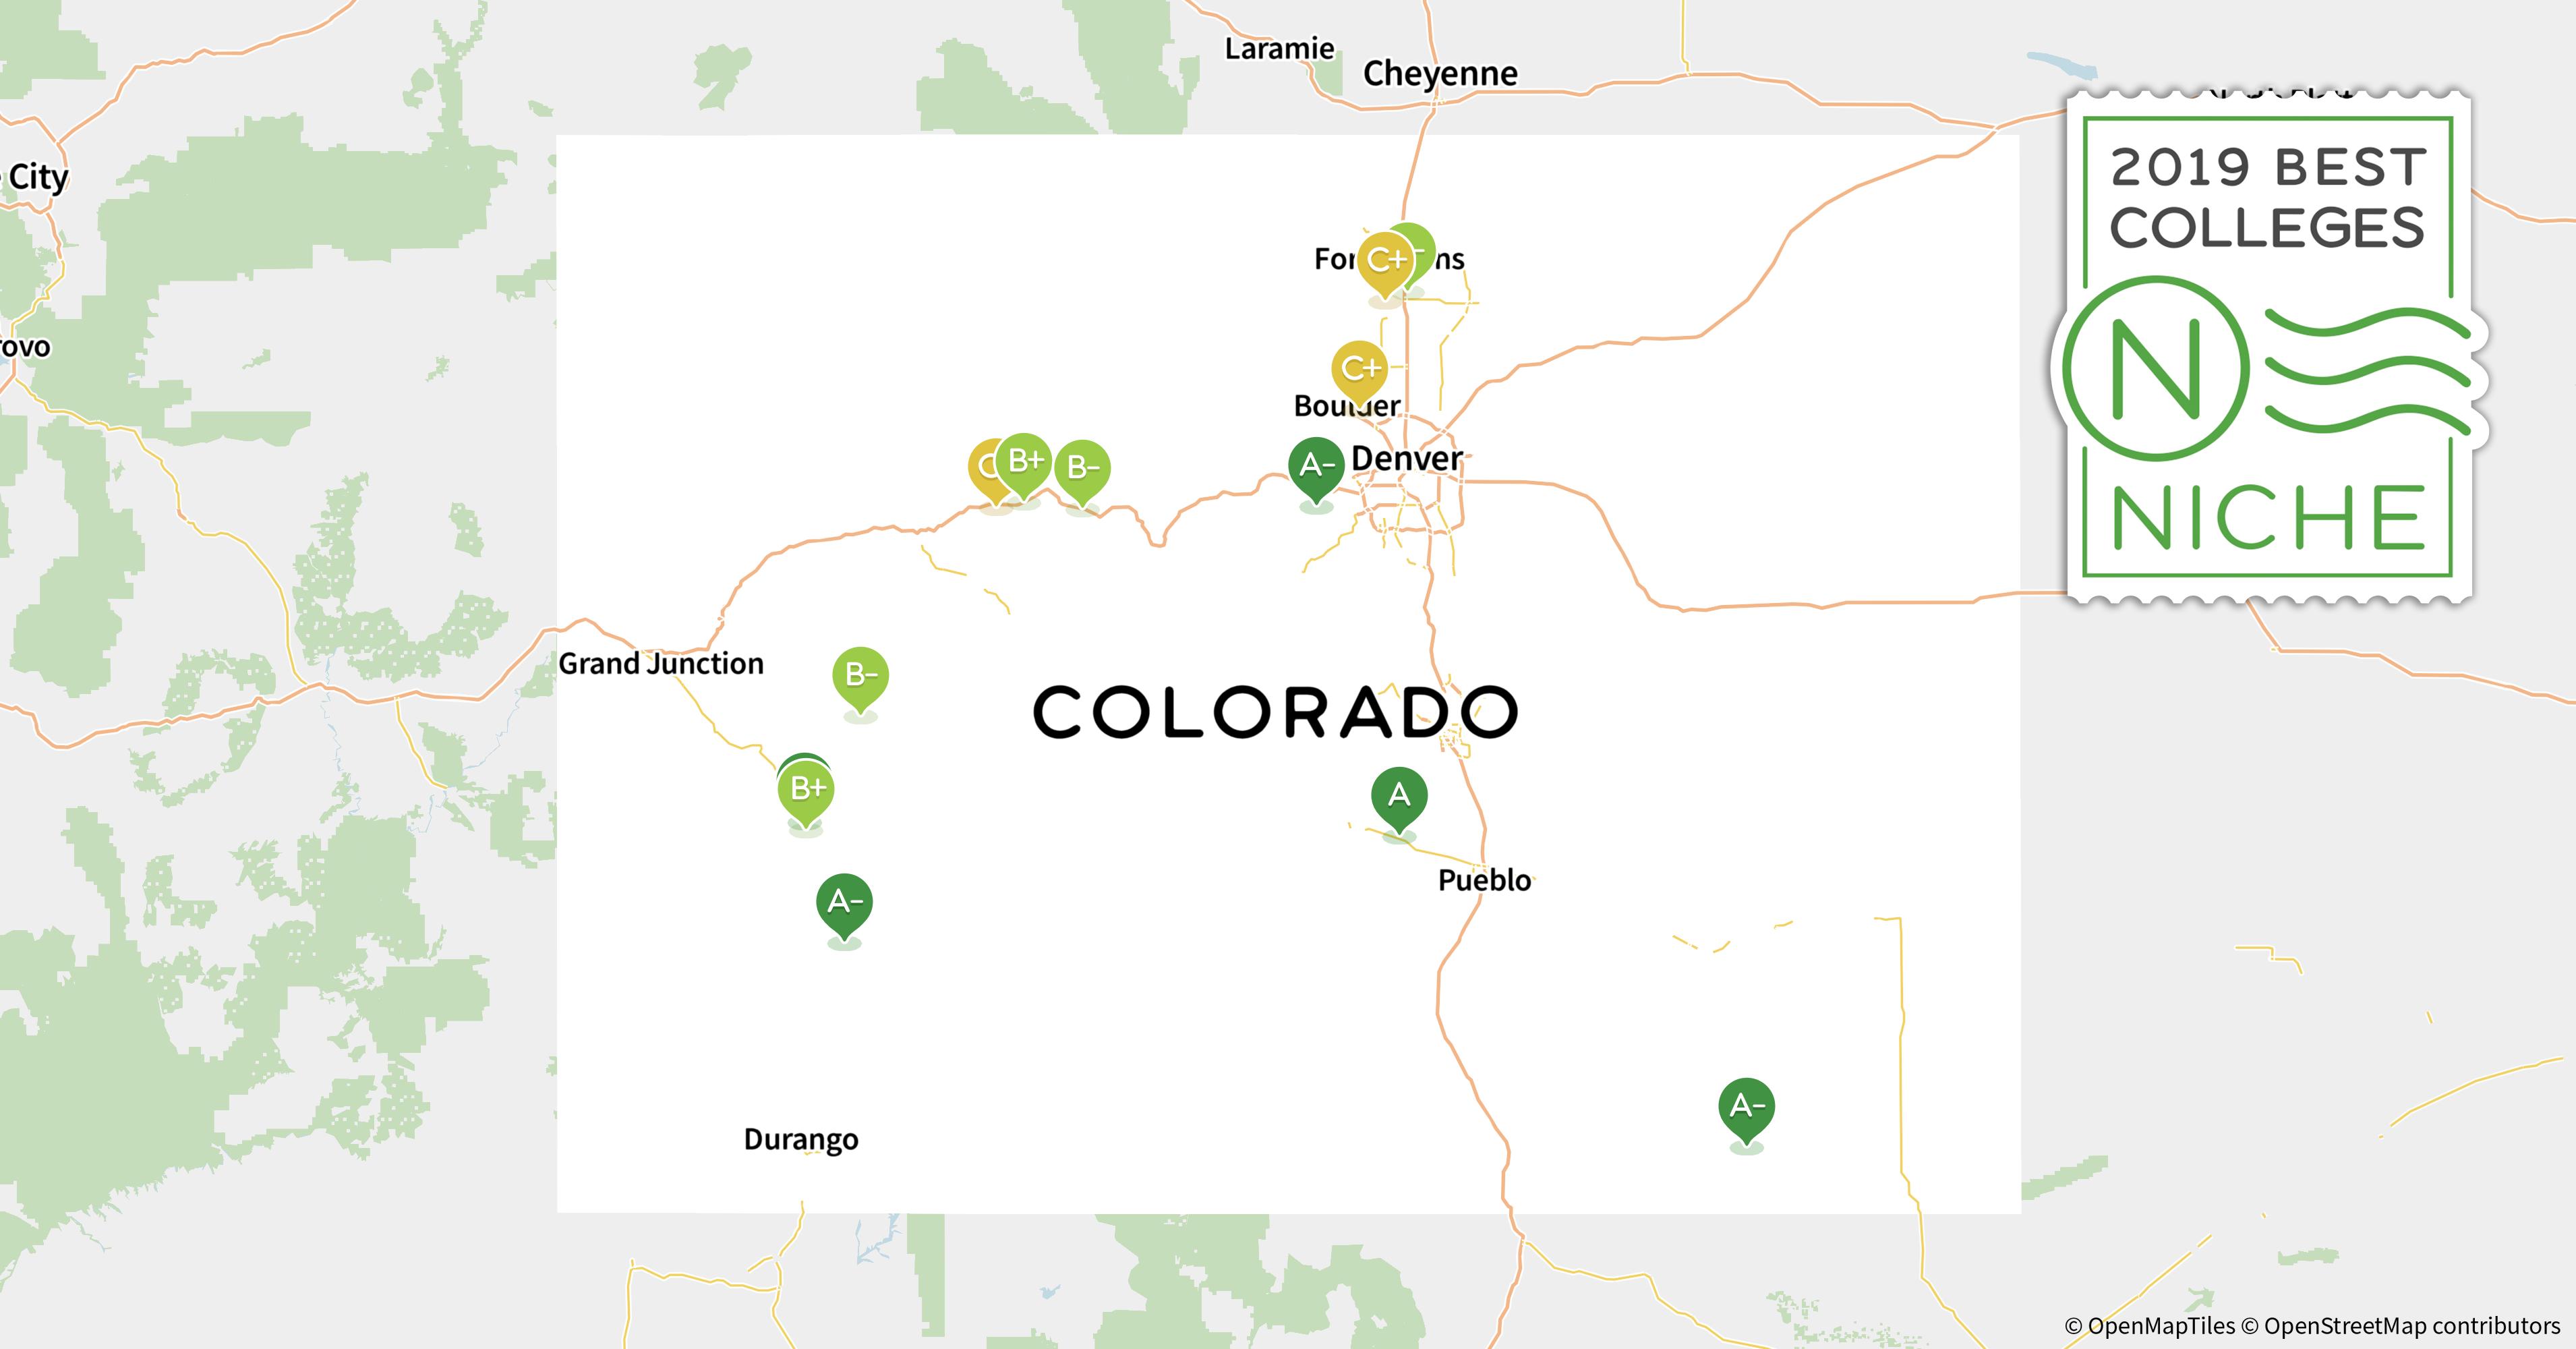 2019 Top Graduate Programs in Colorado - Niche